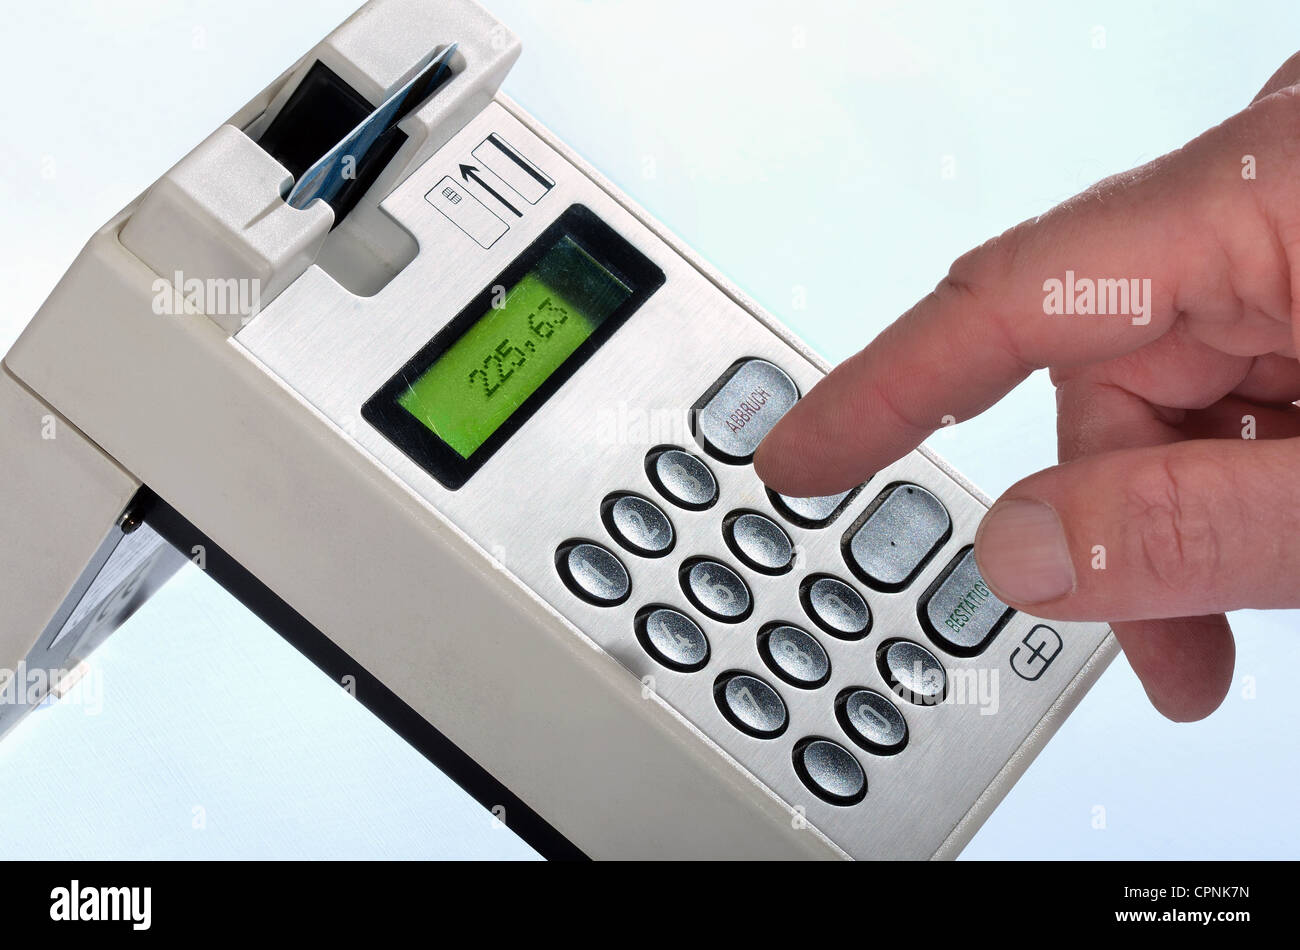 money / finances, EC data terminal, EC card unit, made by Giesecke & Devrient, Ganzfigur, Germany, 1994, Additional - Stock Image